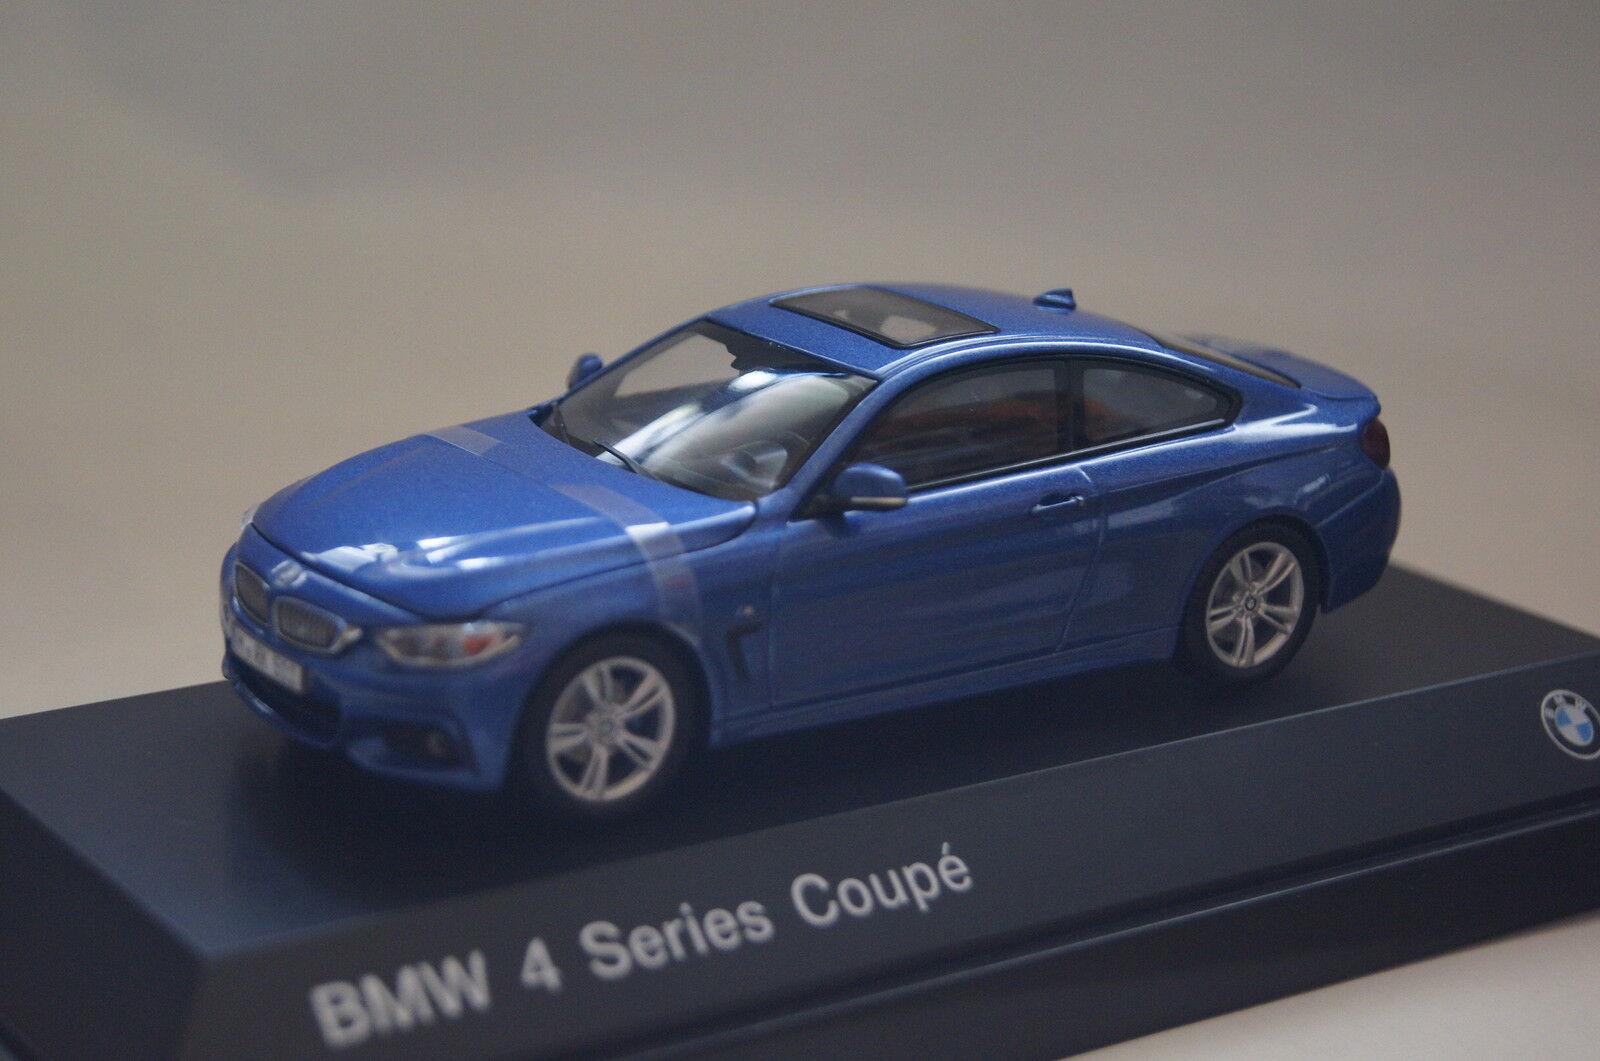 Bmw 4er coupé f32 2014 blau metallic 1 43 bmw neu & ovp 80422318858